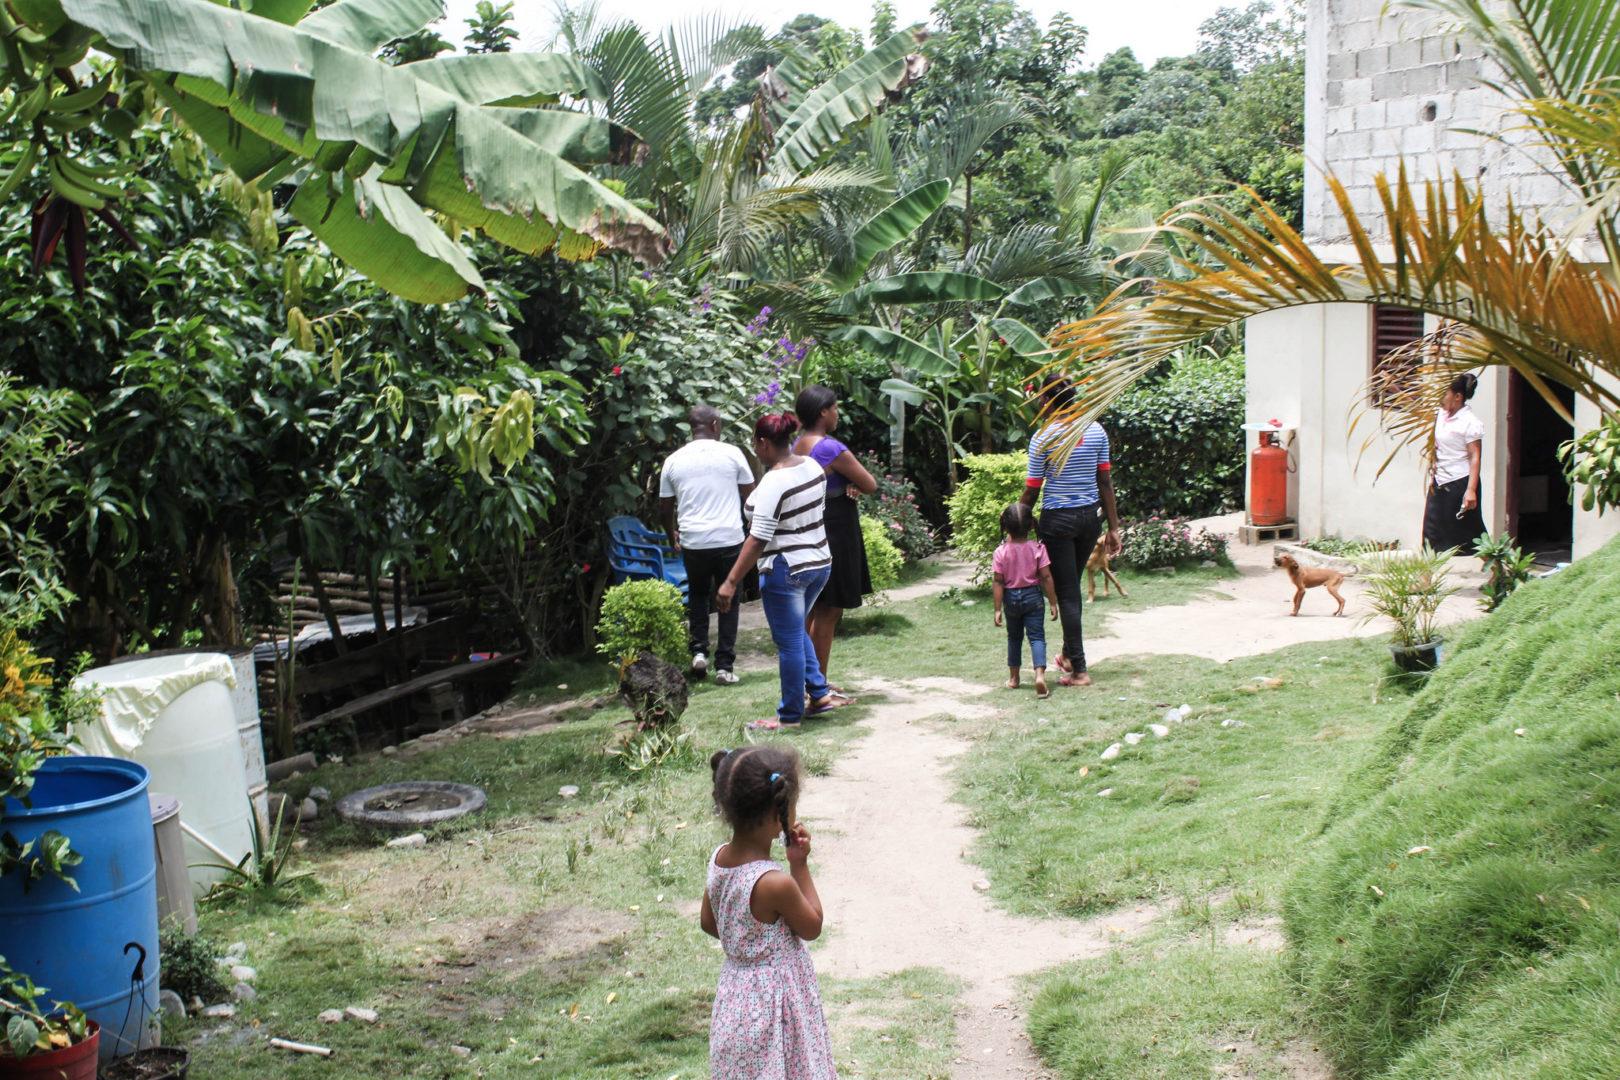 A young girl surveys her home village of La Joya.